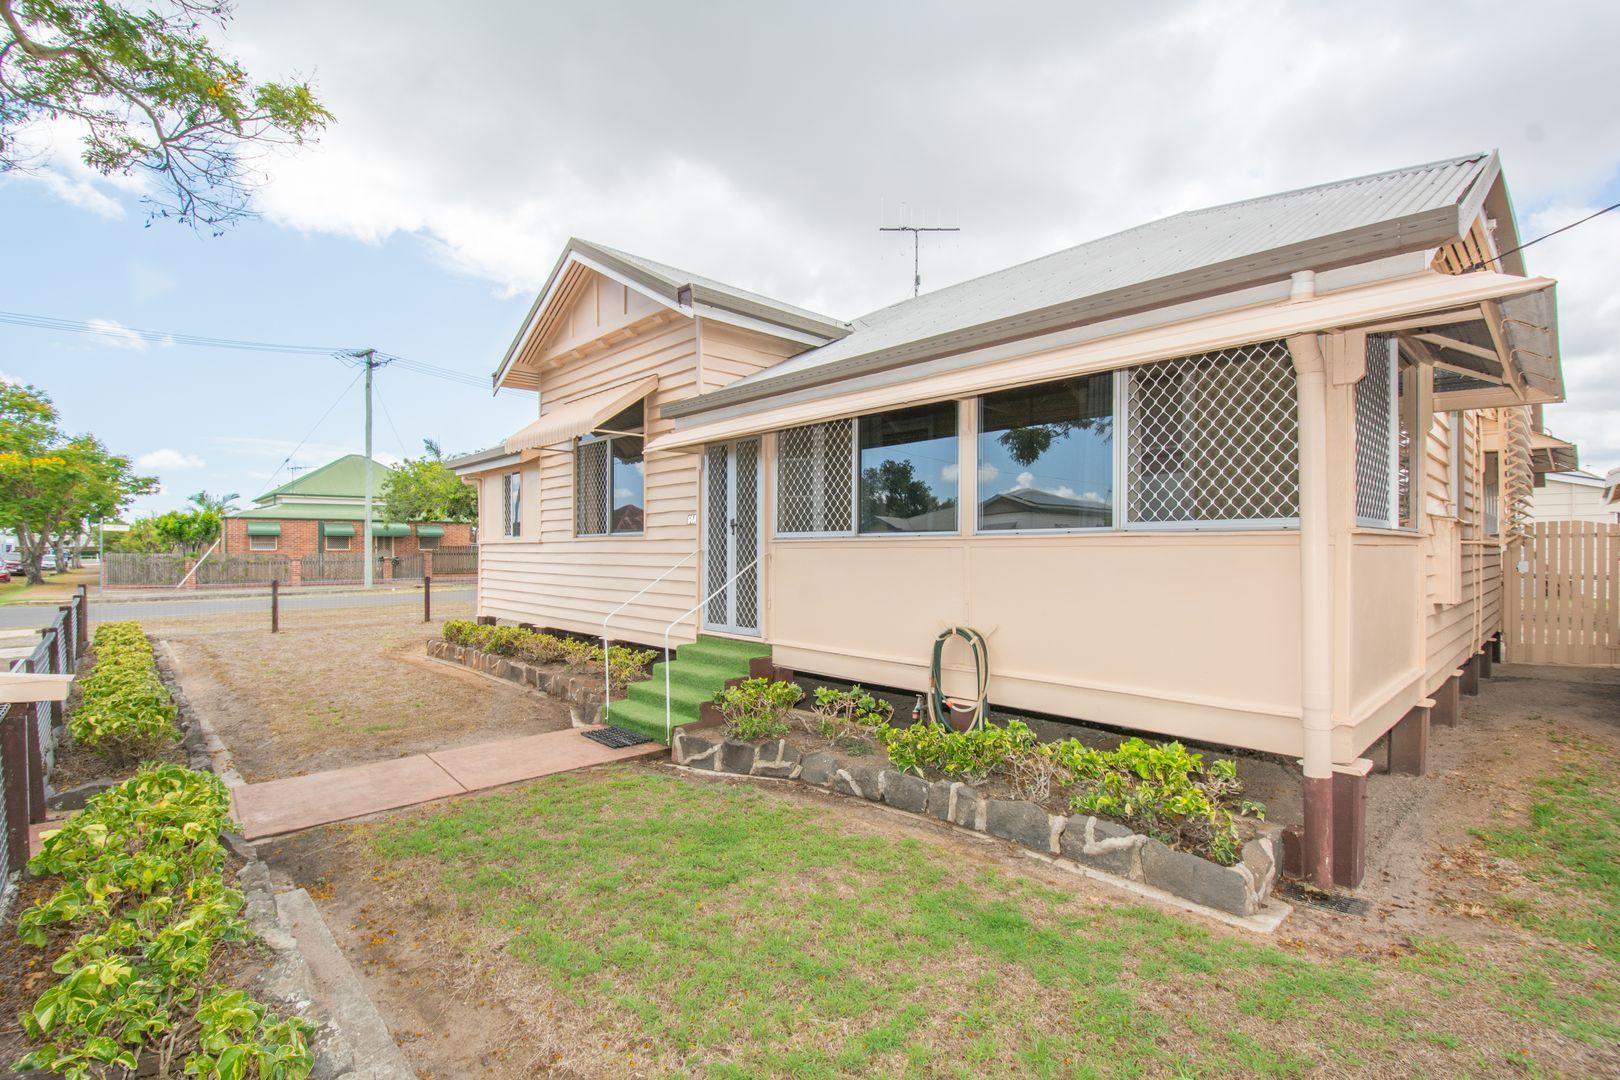 64A Ruddell Street, Bundaberg South QLD 4670, Image 0